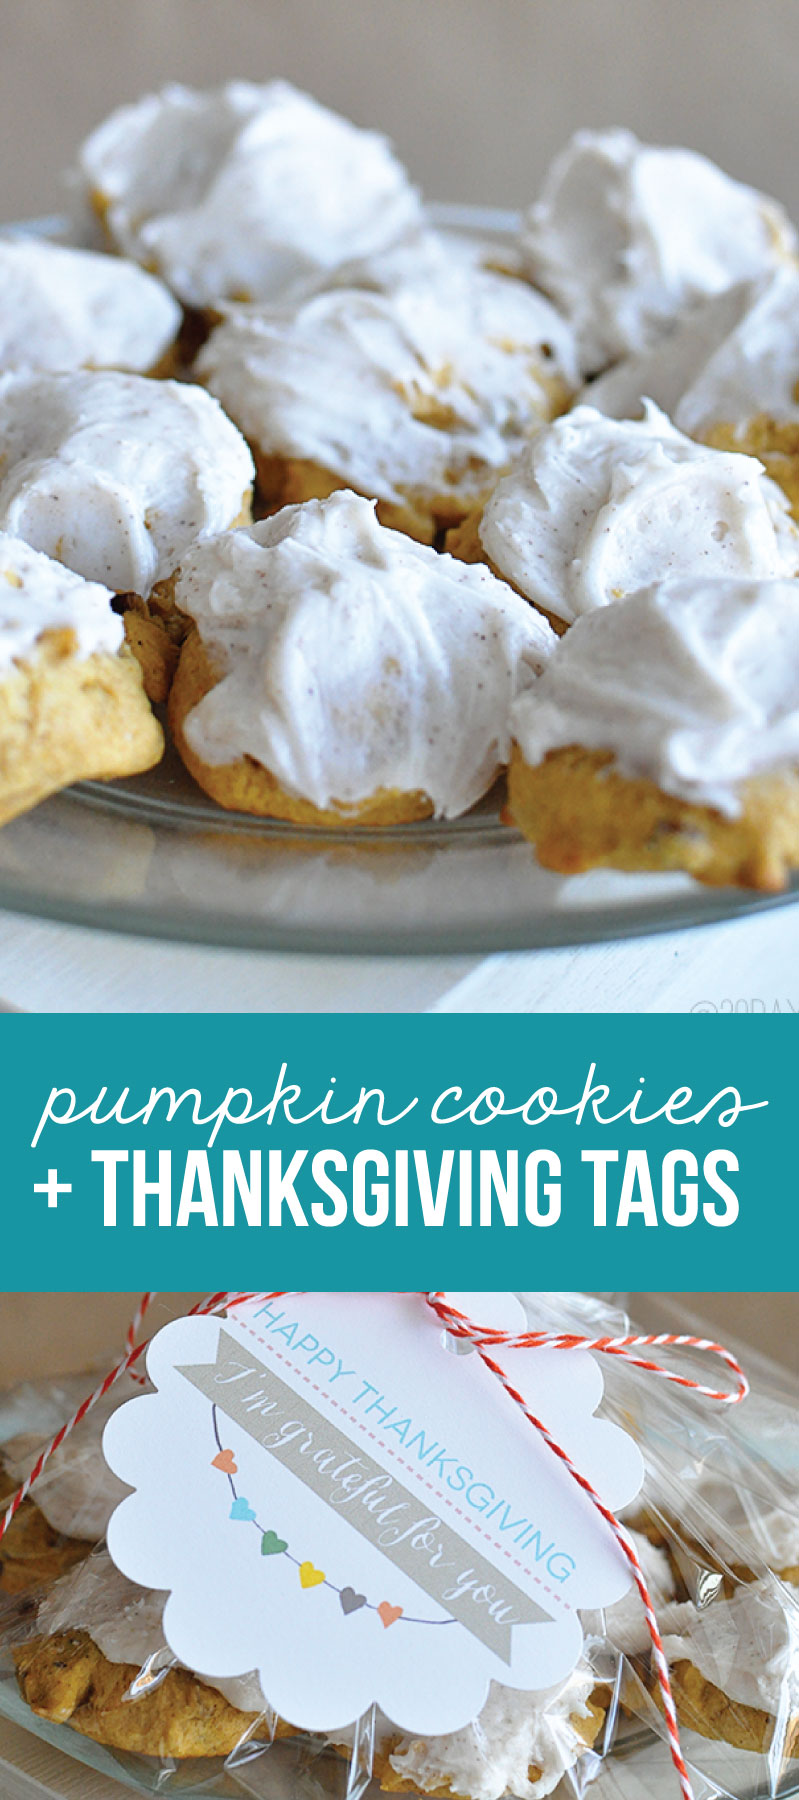 Frosted Pumpkin Cookies + Printable Thanksgiving Tags www.thirtyhandmadedays.com